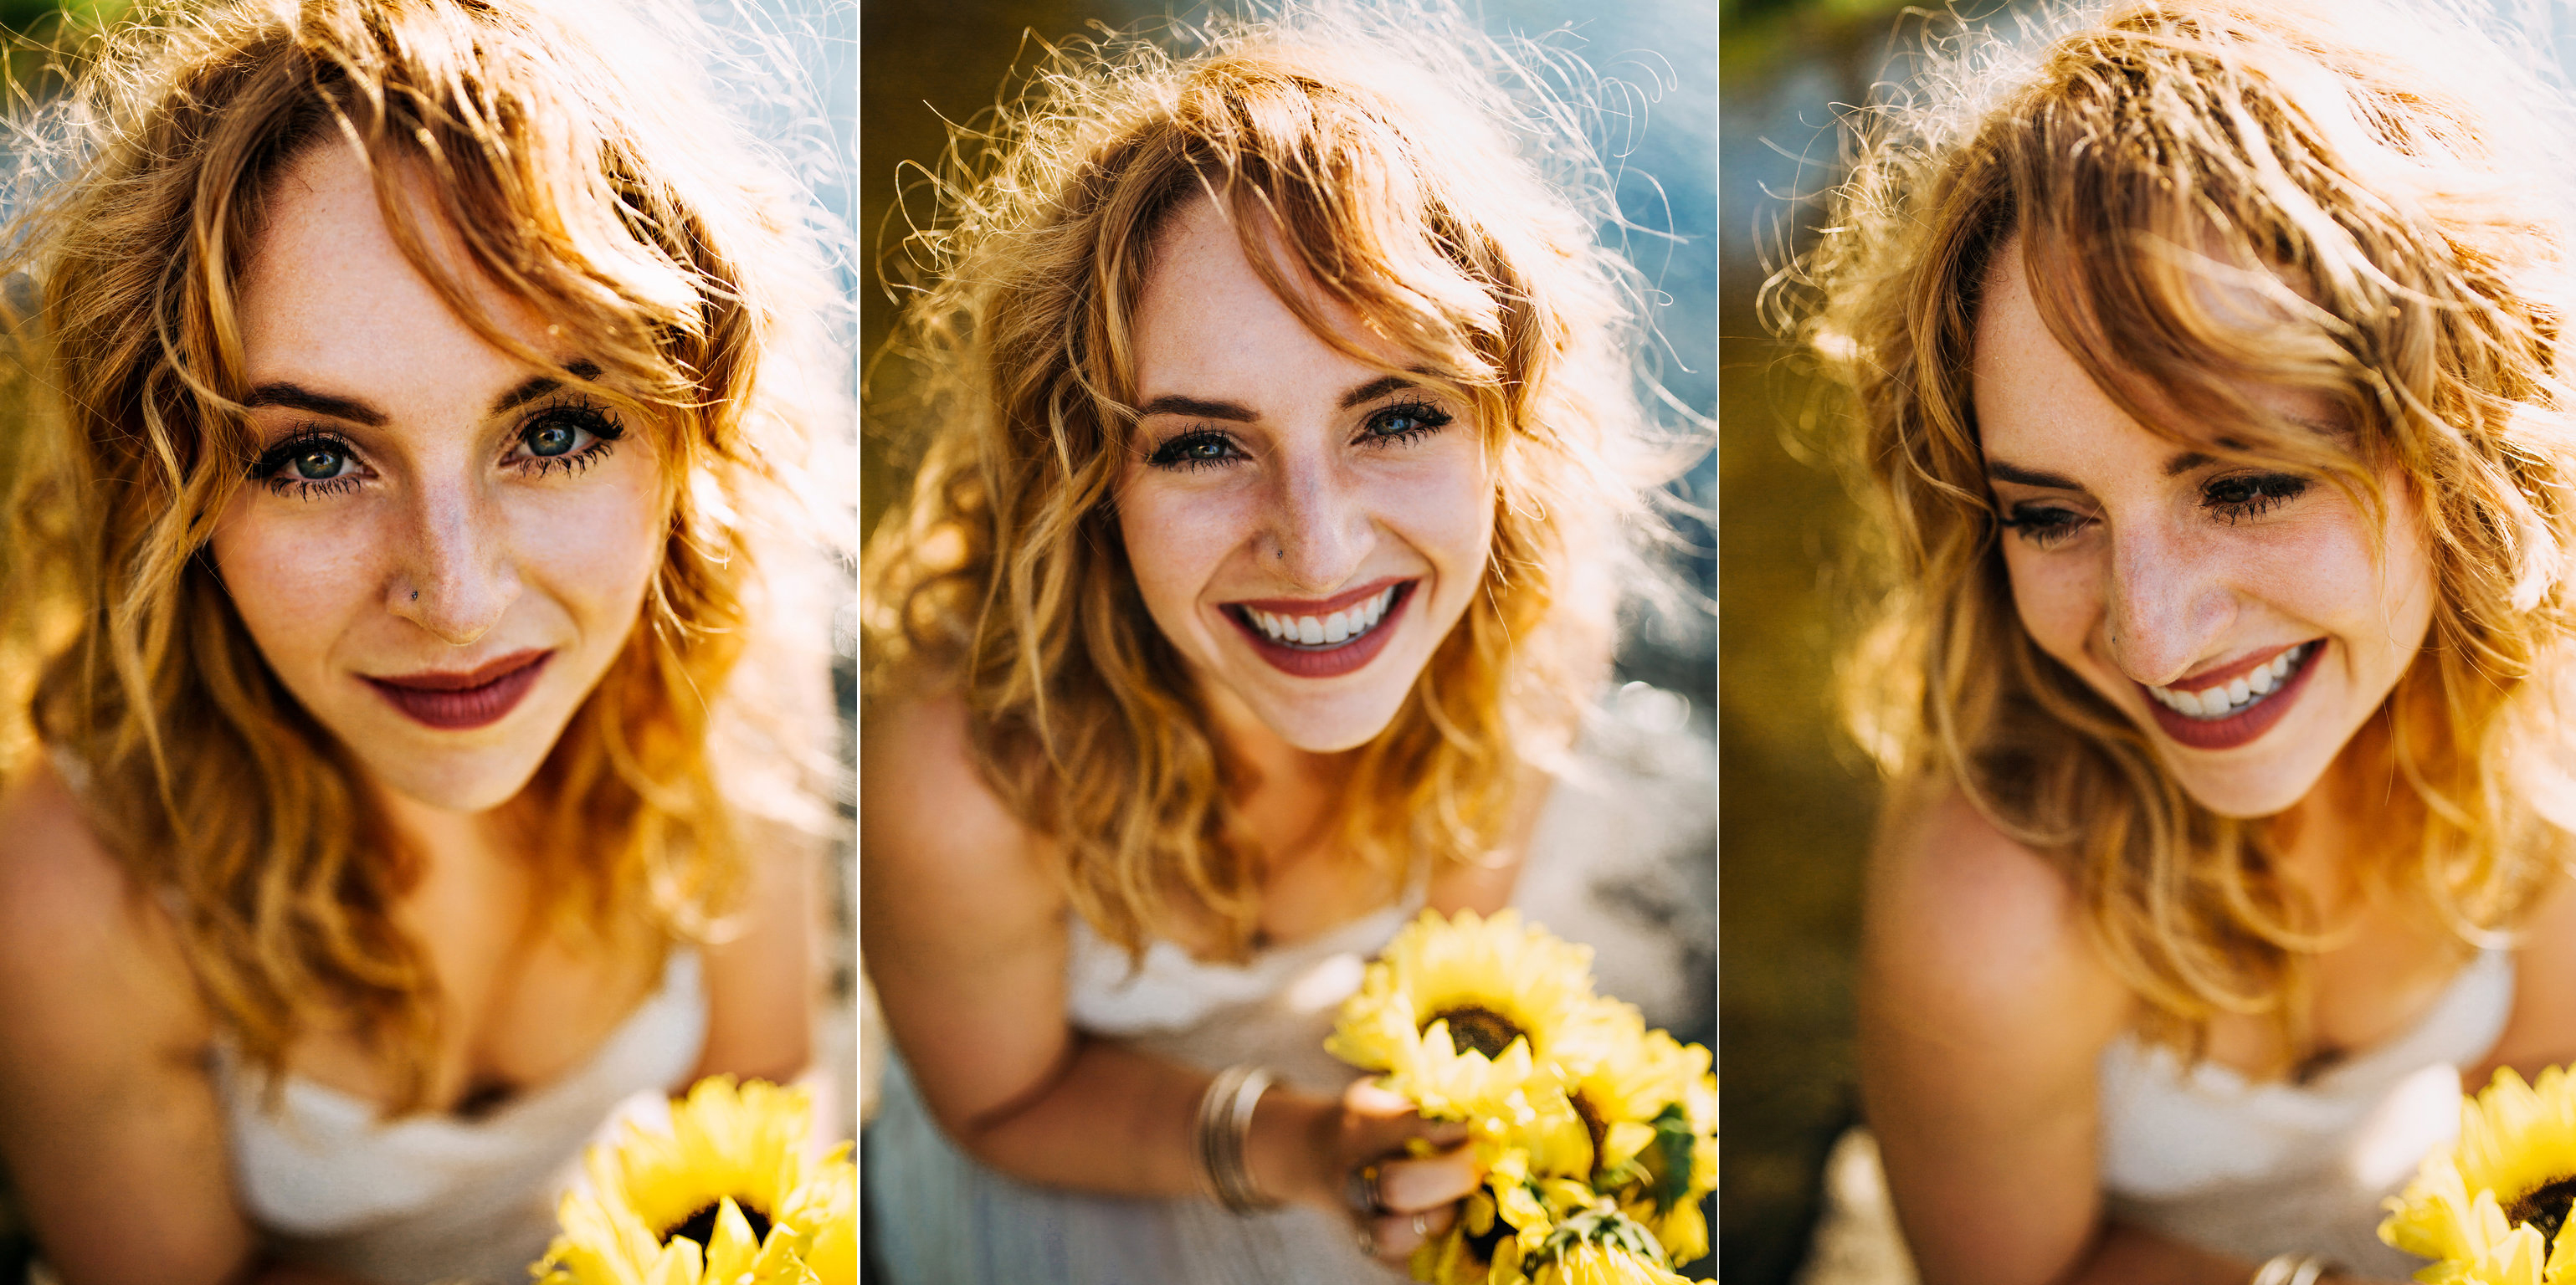 Camille-Joy-Music-Franklin-Tennessee-Photographer-Creek-Berry-Farms-Senior-Portraits-Water-15